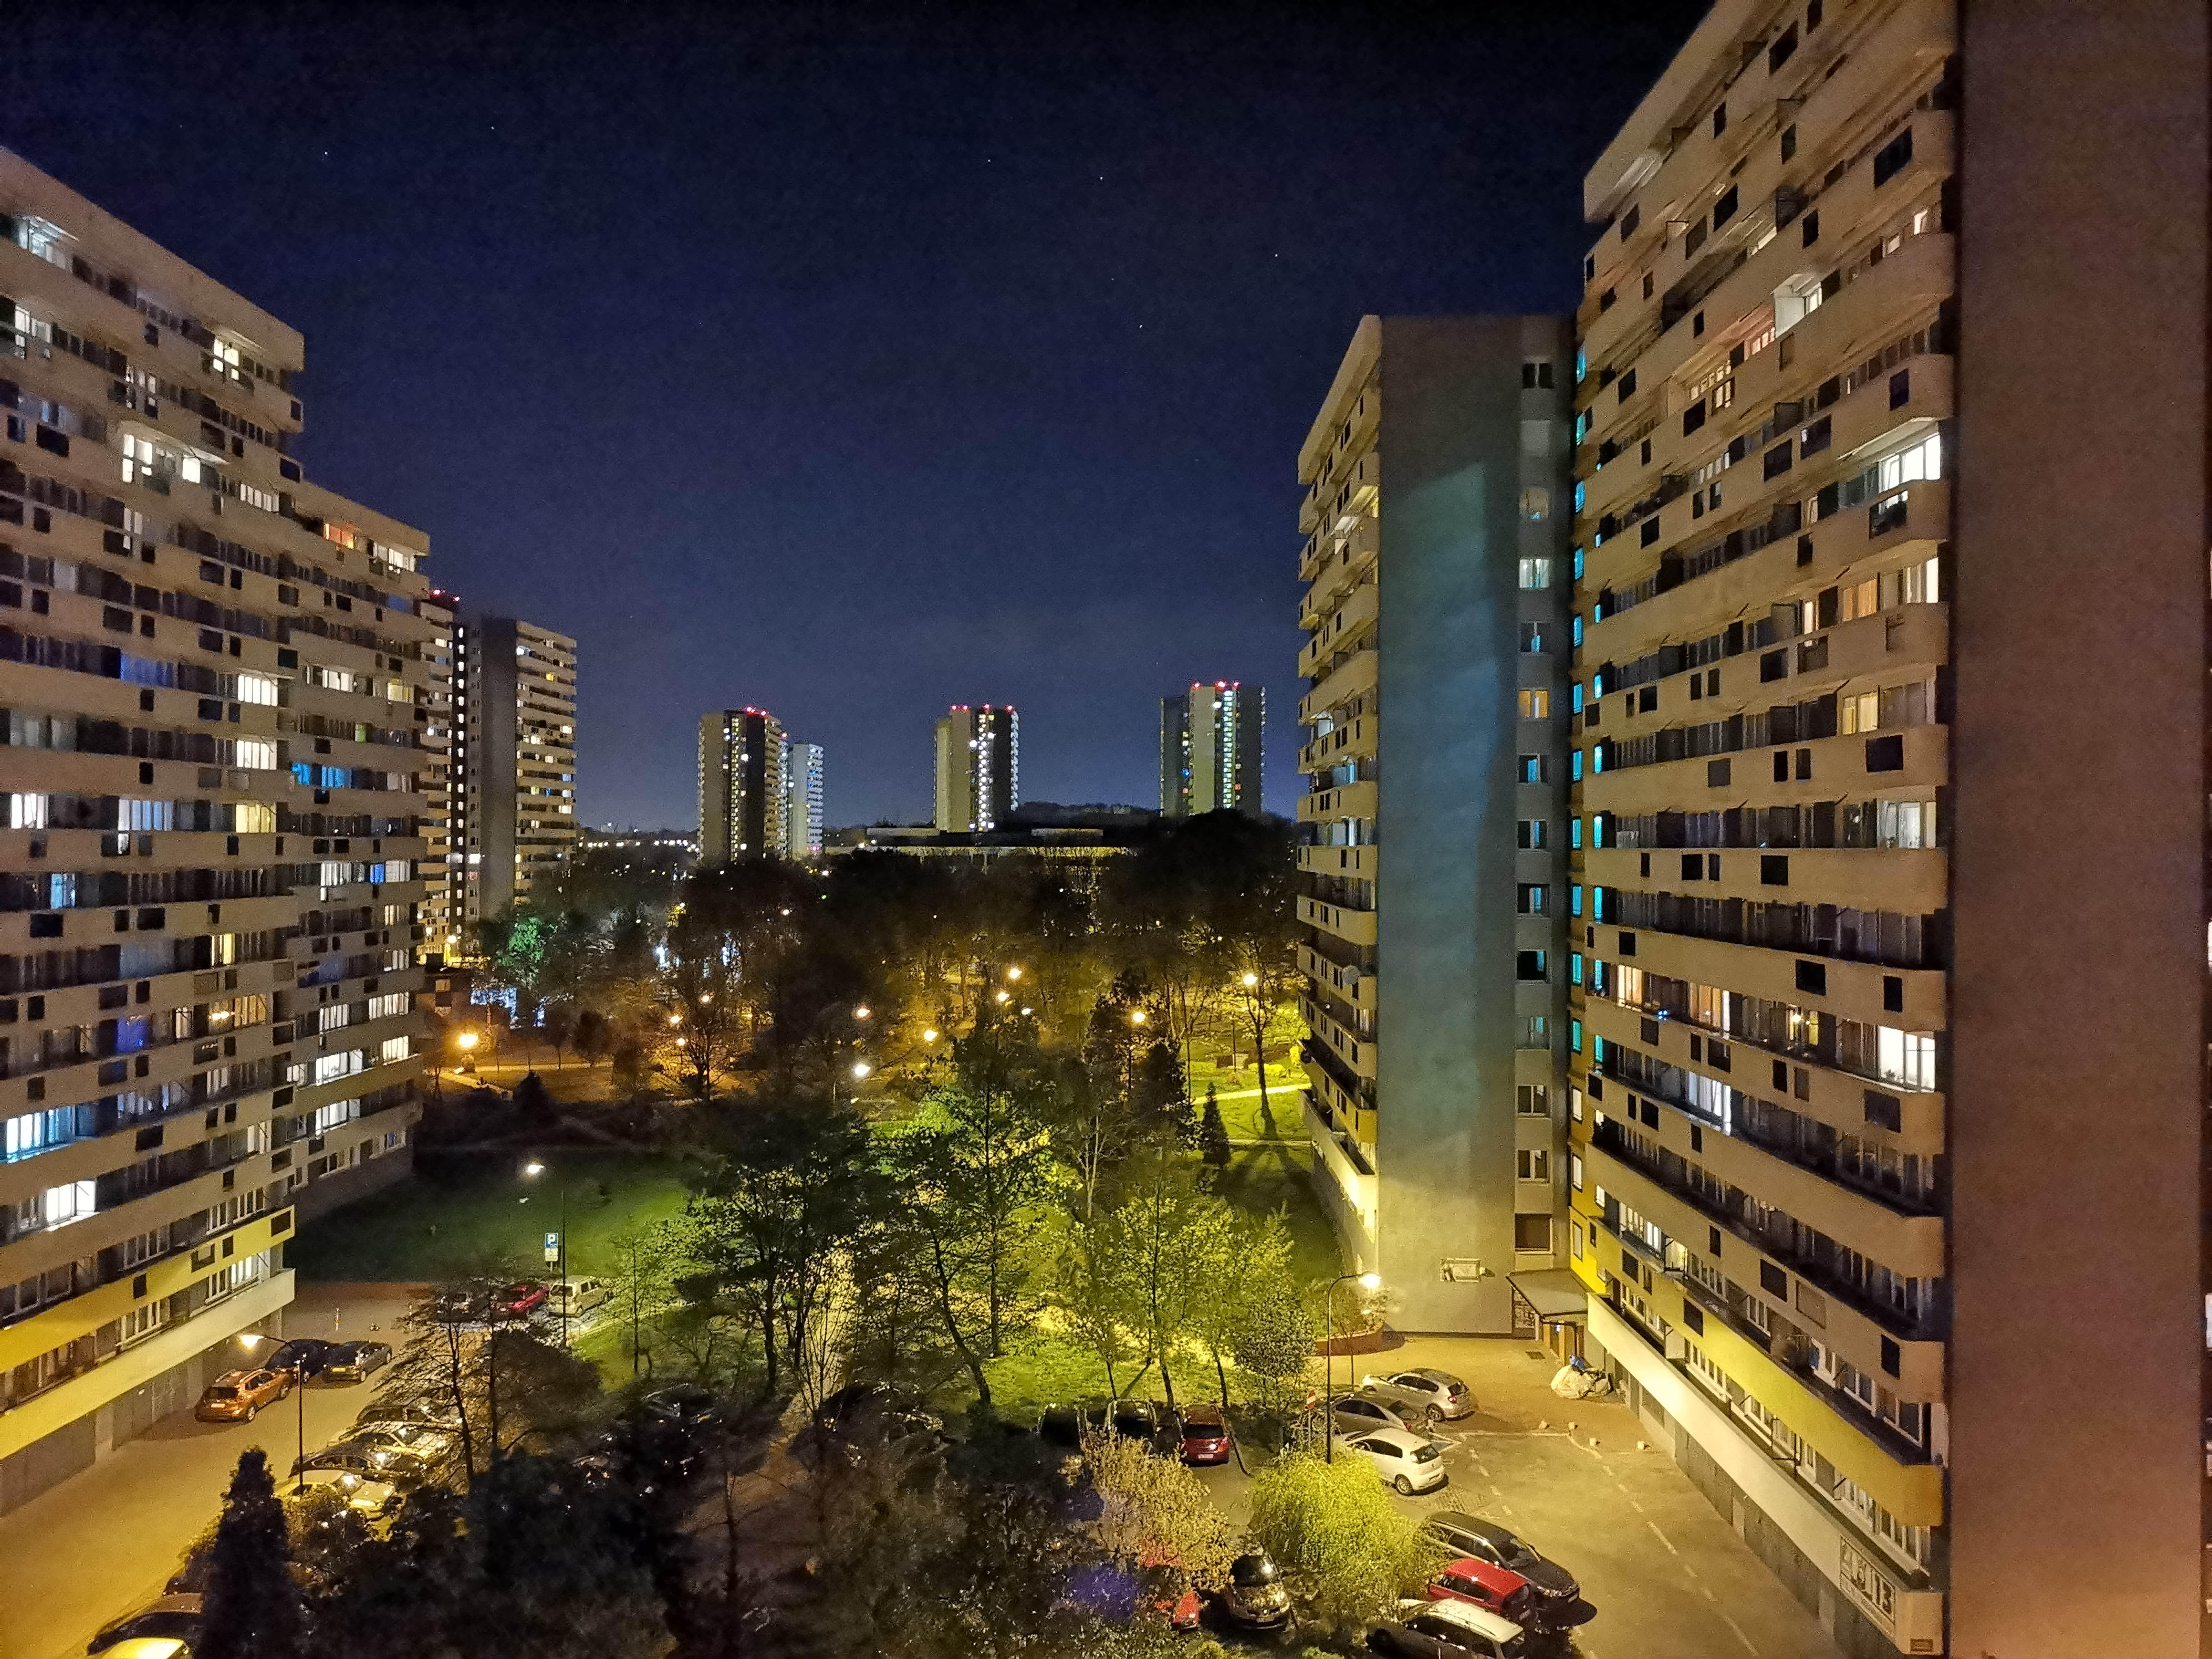 Zdjęcia nocne - Honor View 20